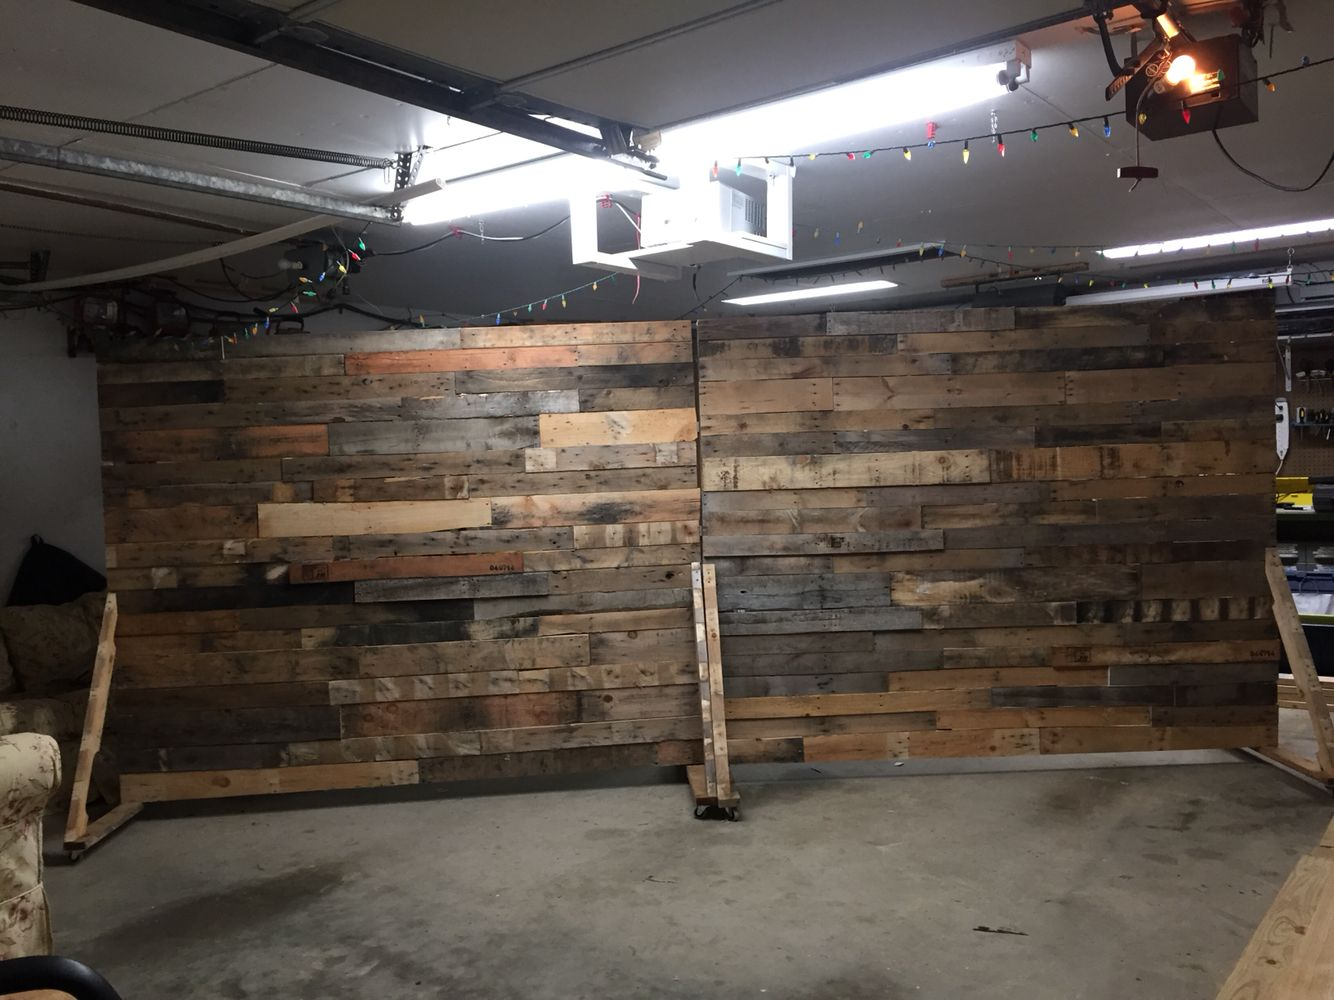 Portable Pallet Wall For Church Backdrop Diy Pallet Wall